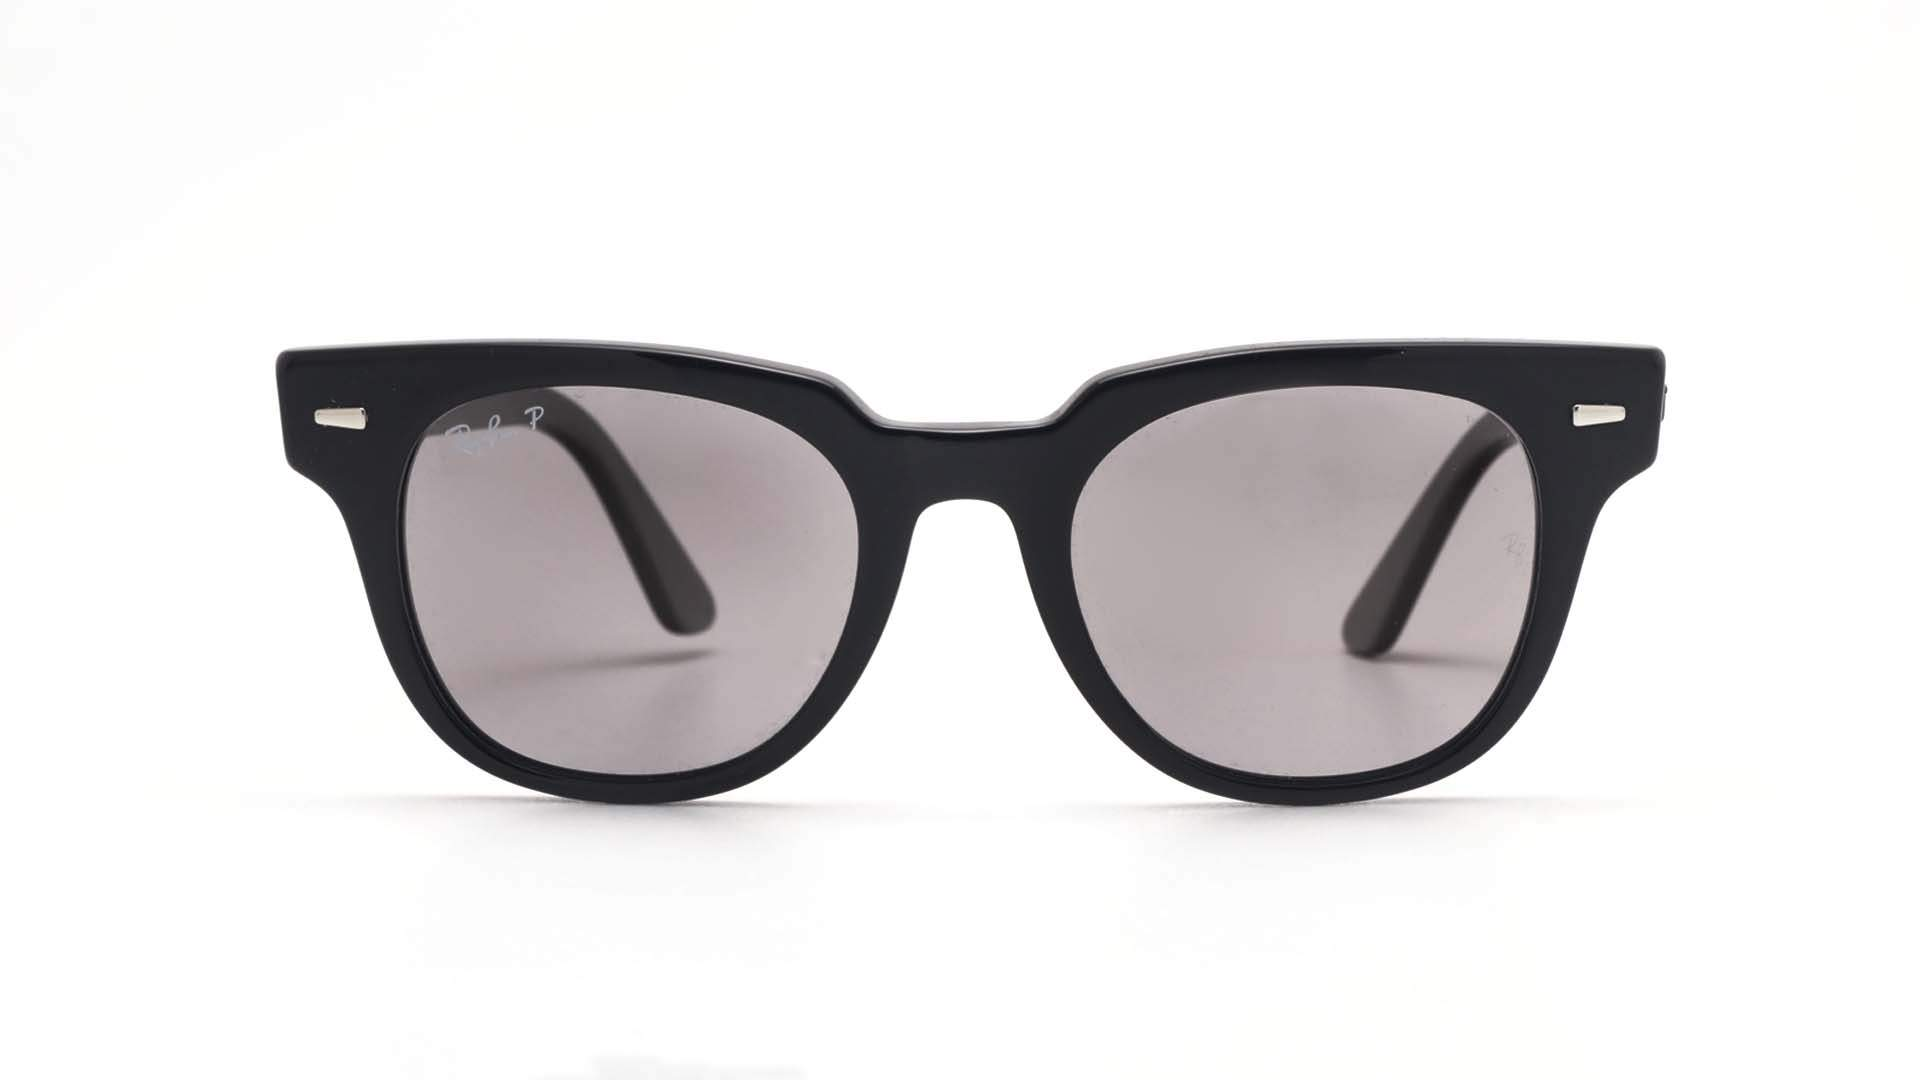 5f7f010b75 Sunglasses Ray-Ban Meteor Black RB2168 901 P2 50-20 Medium Polarized